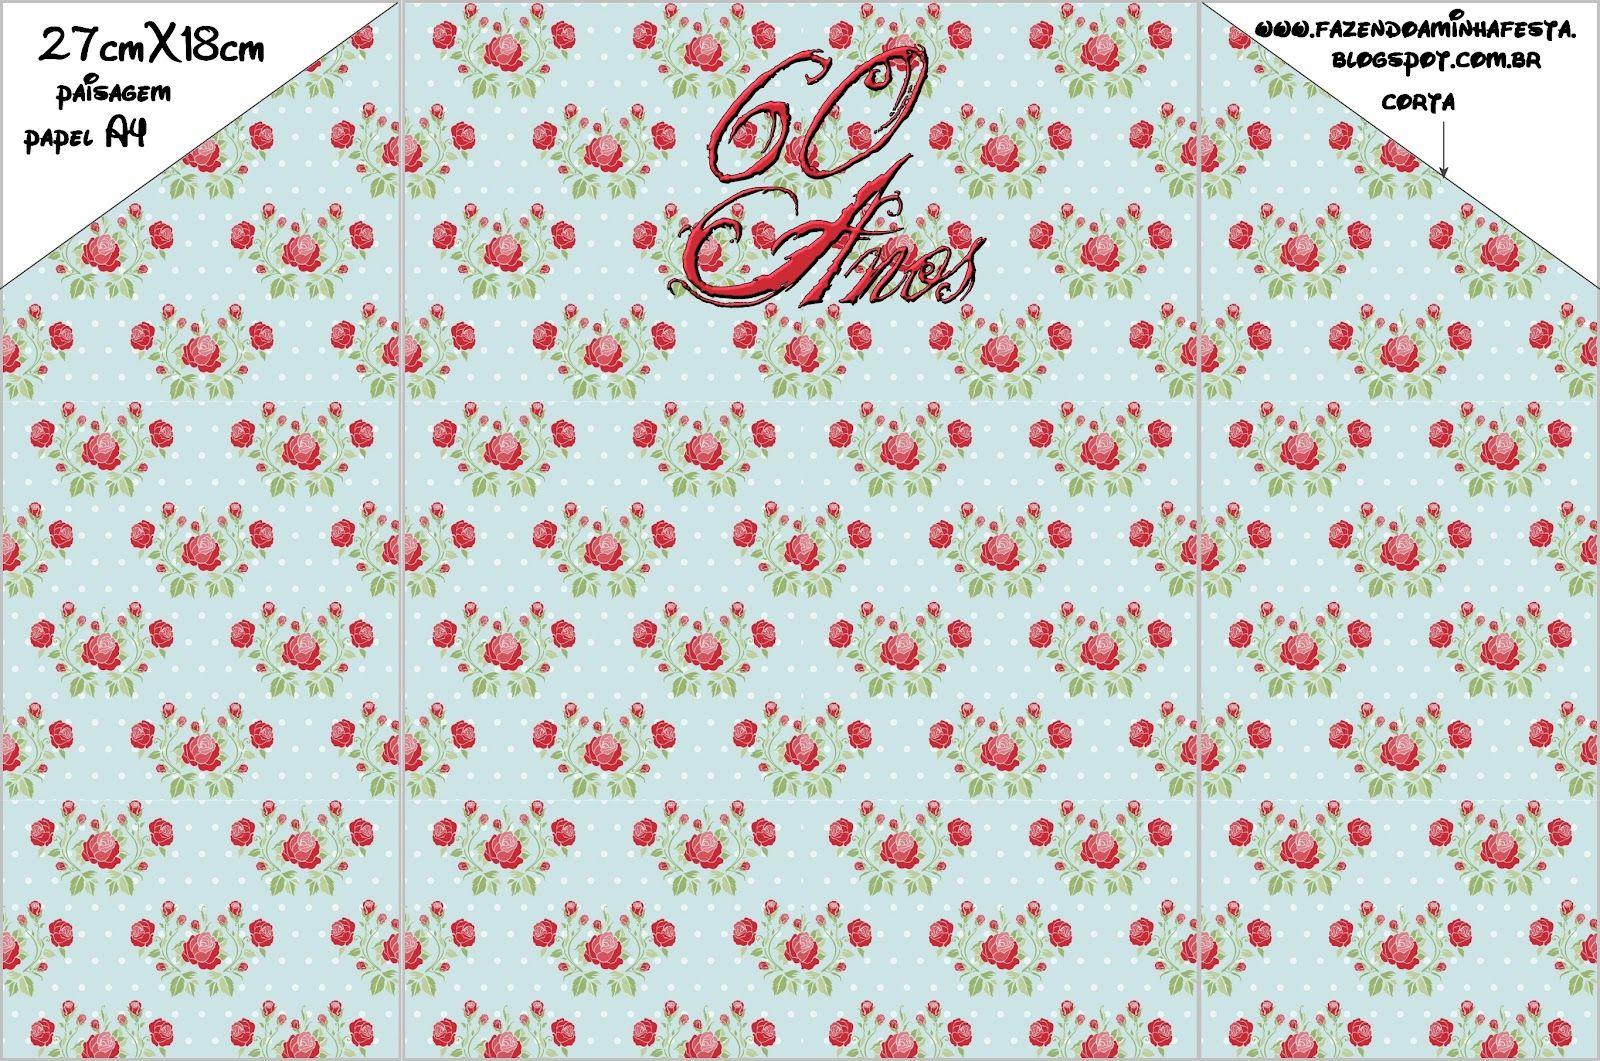 Fondos De Flores Wallpapers Hd Gratis: Fondo De Flores Para Tarjetas Wallpaper Hd Para Bajar Gratis 3